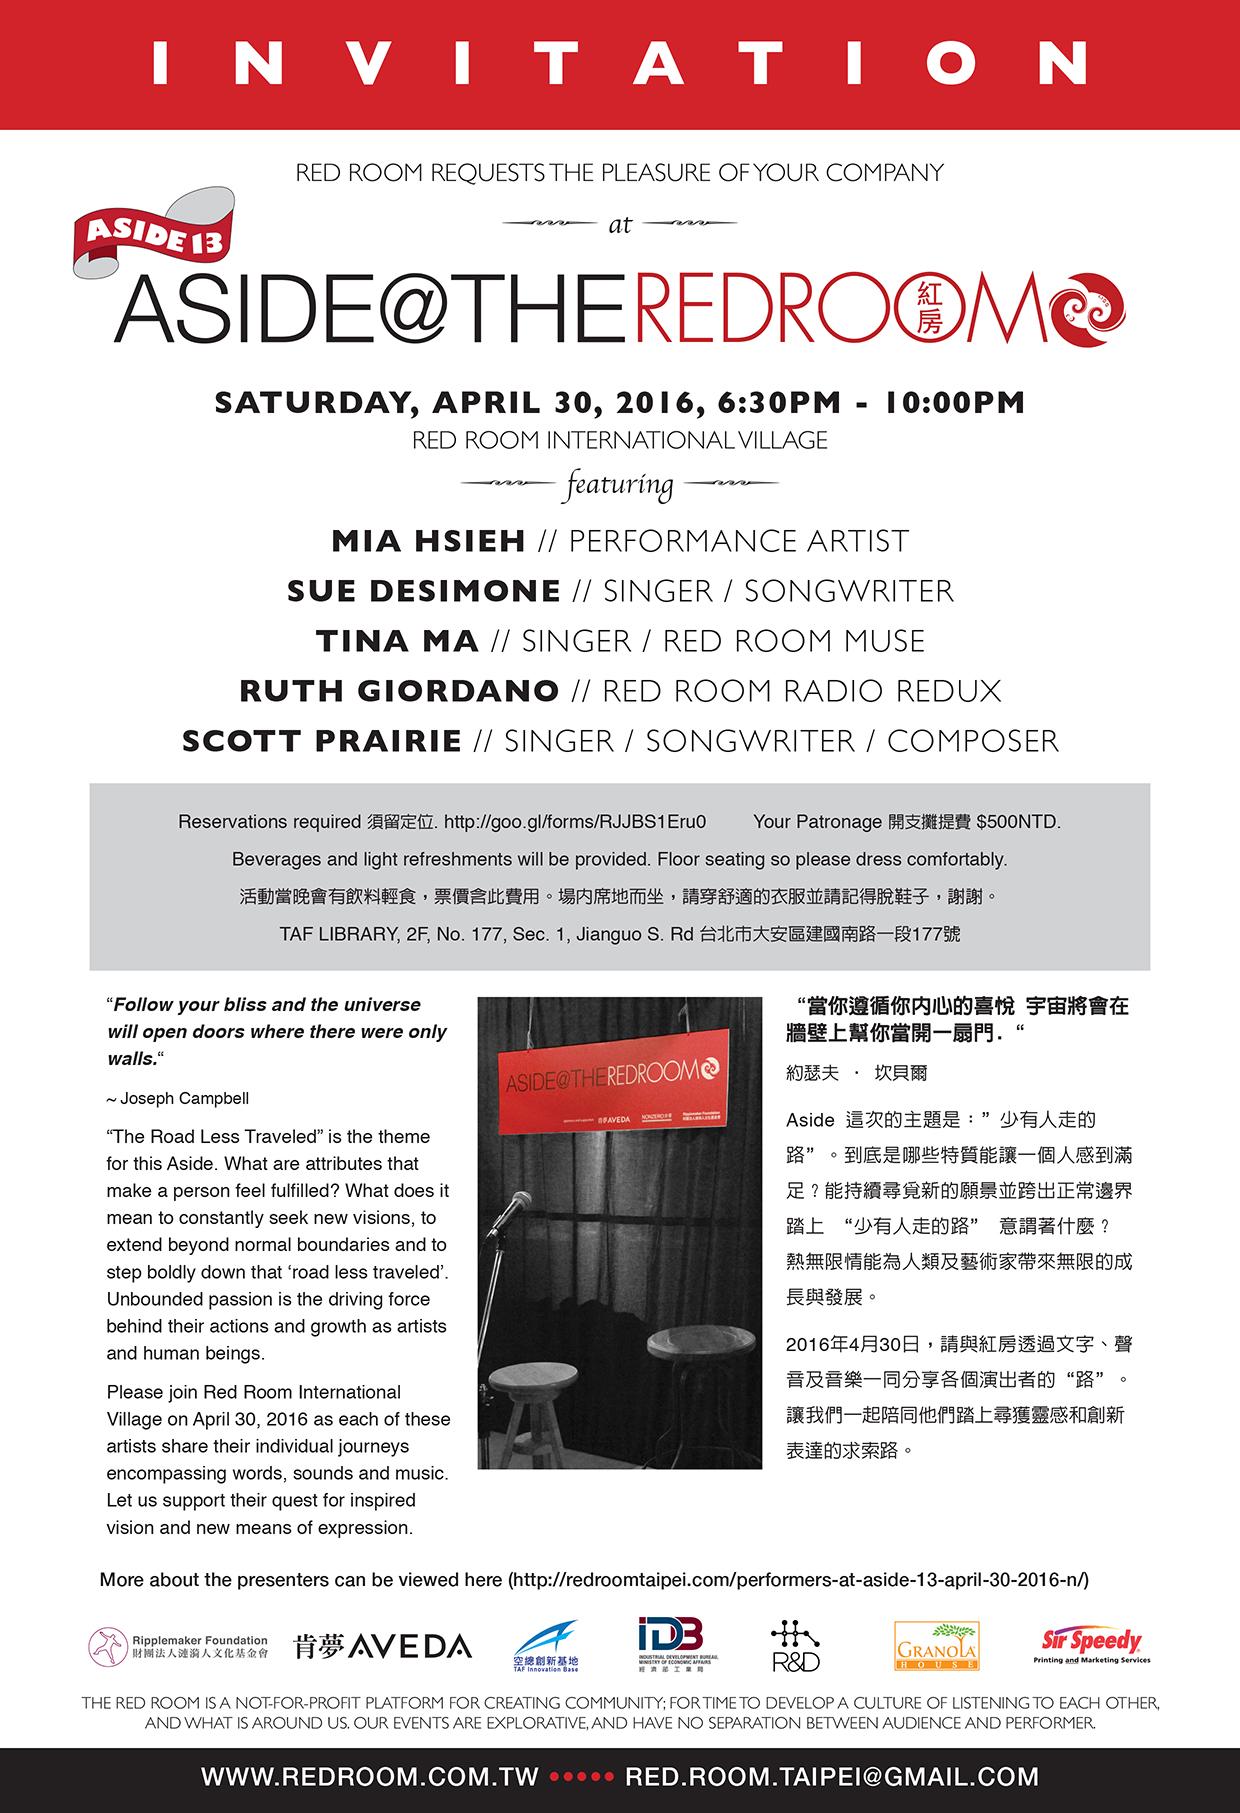 Red Room Aside 13 invite